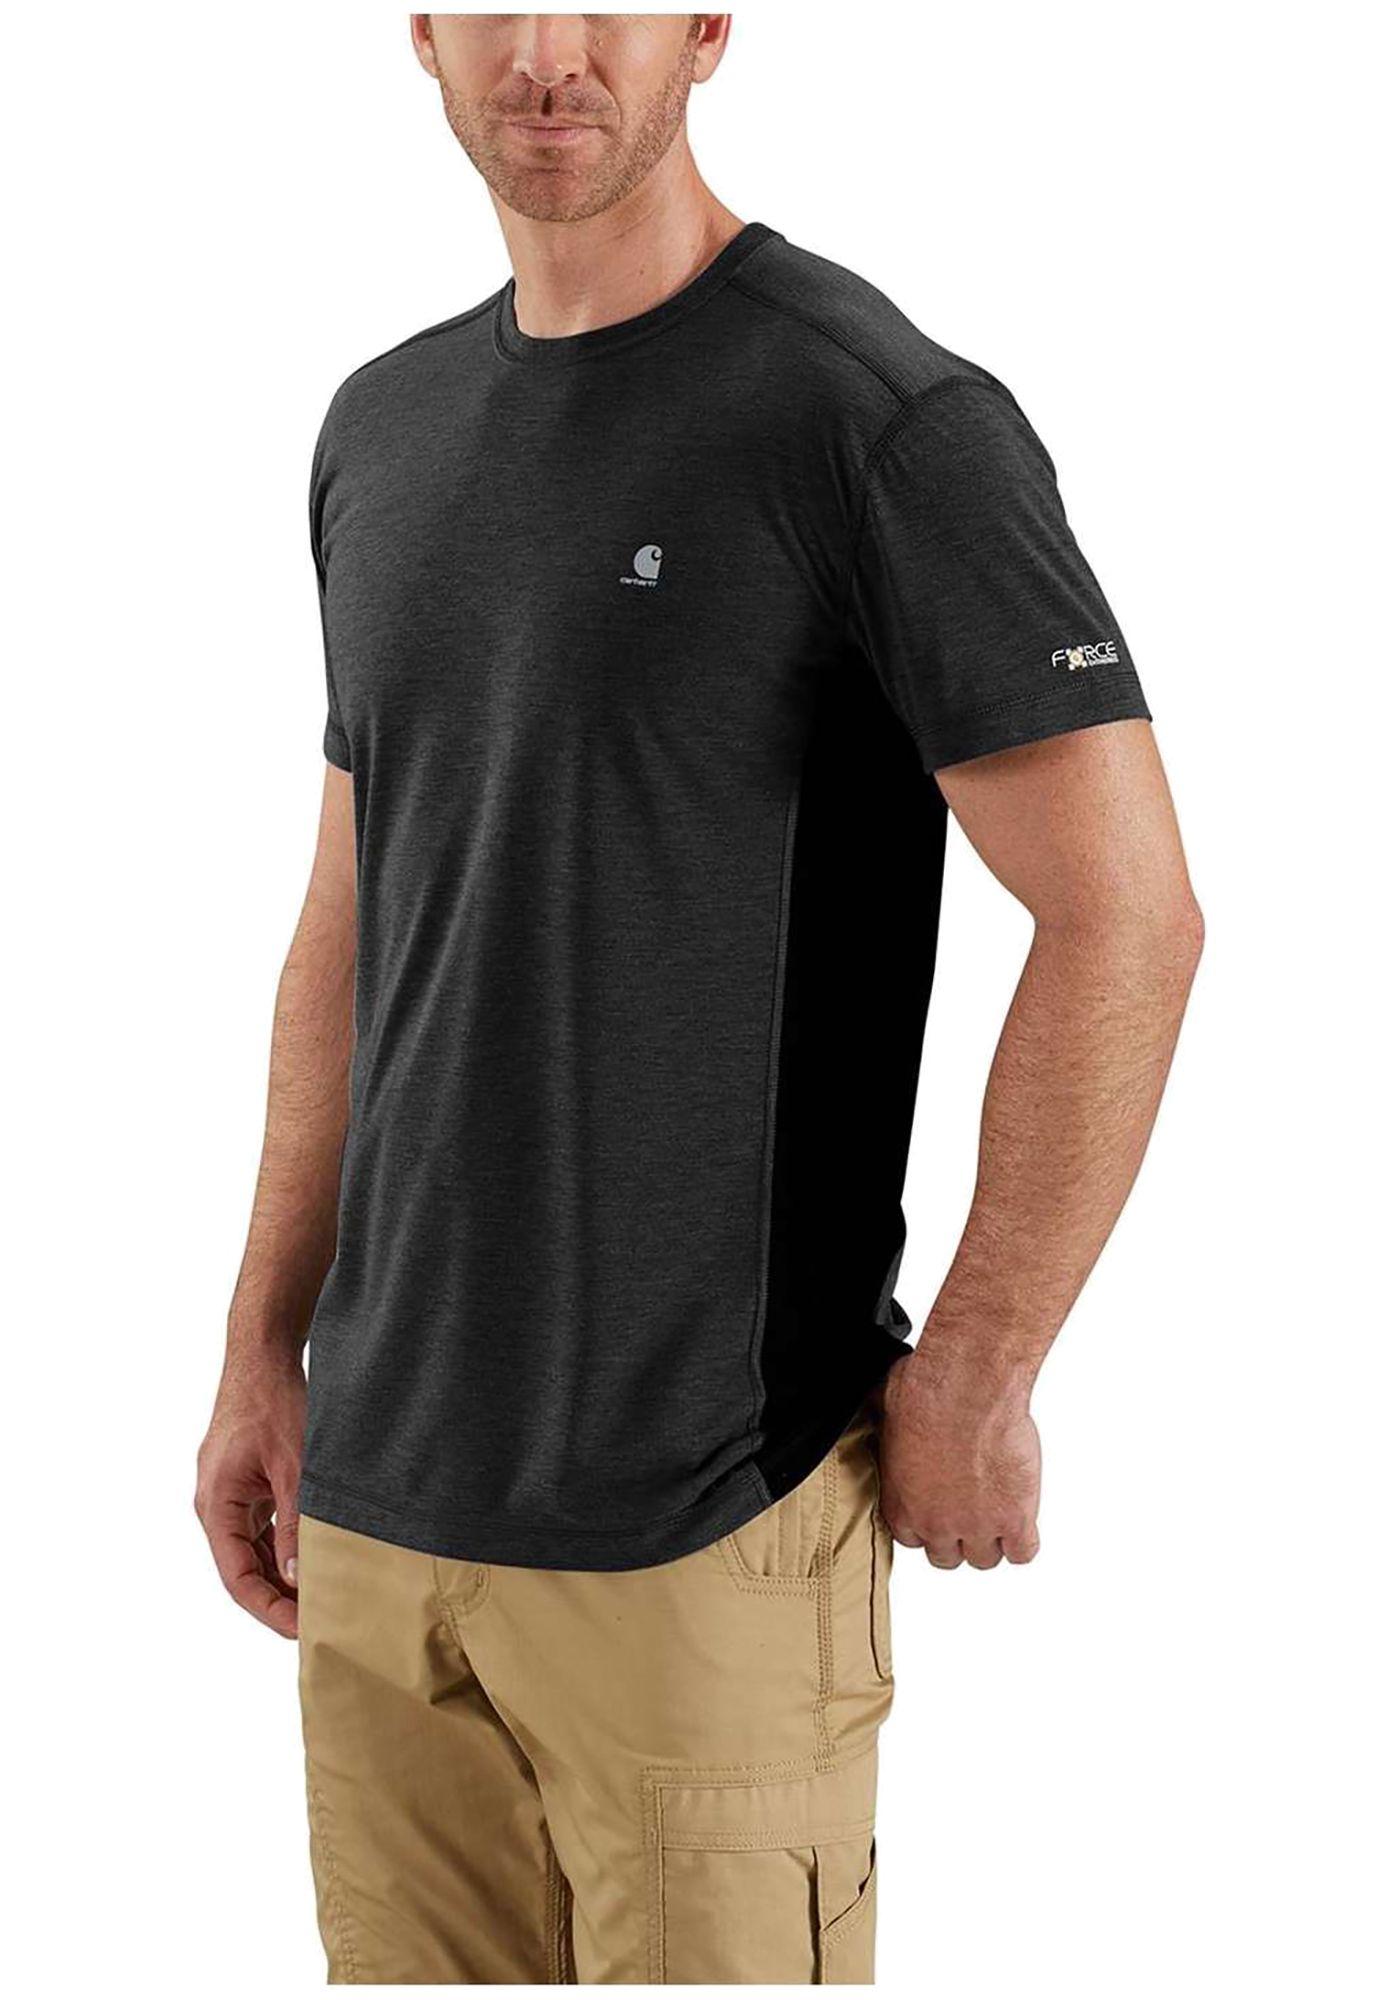 Carhartt Men's Force Extreme T-Shirt